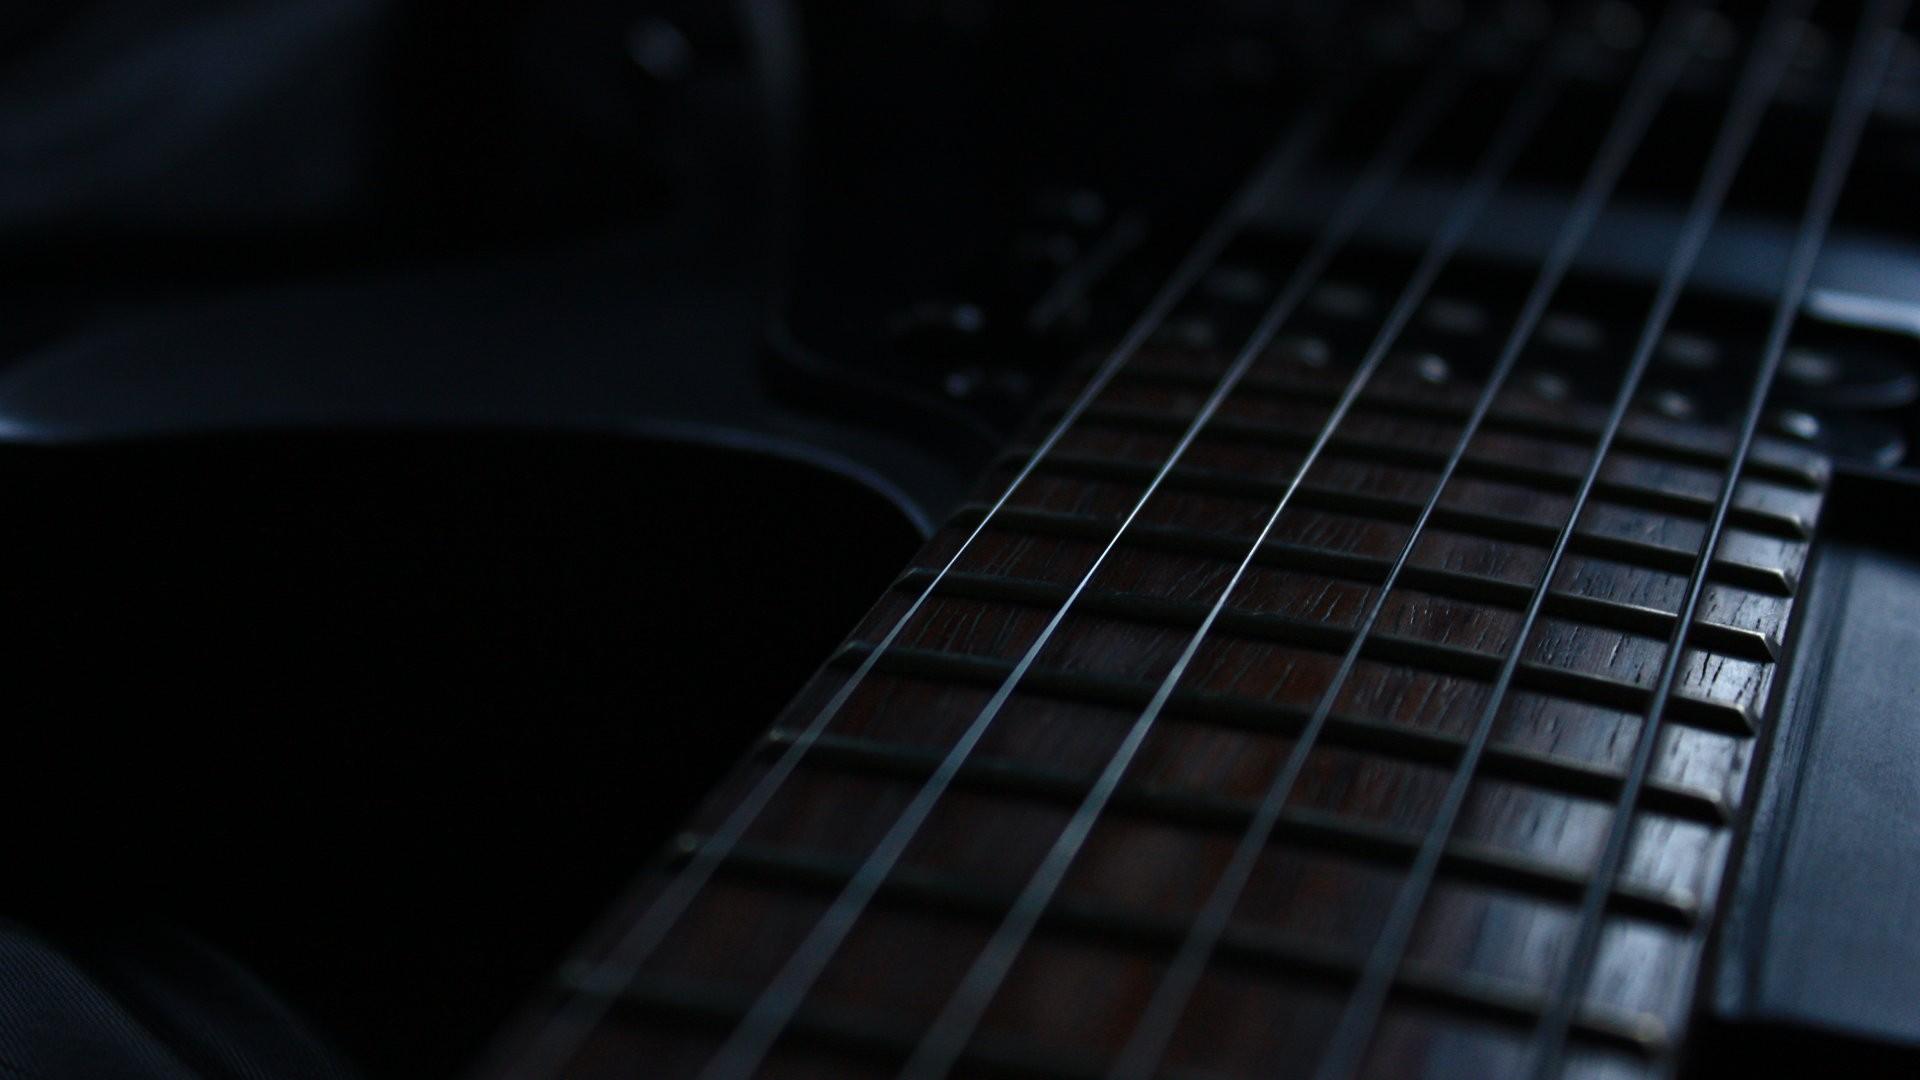 49 Guitar Wallpapers 1920x1080 Widescreen On Wallpapersafari